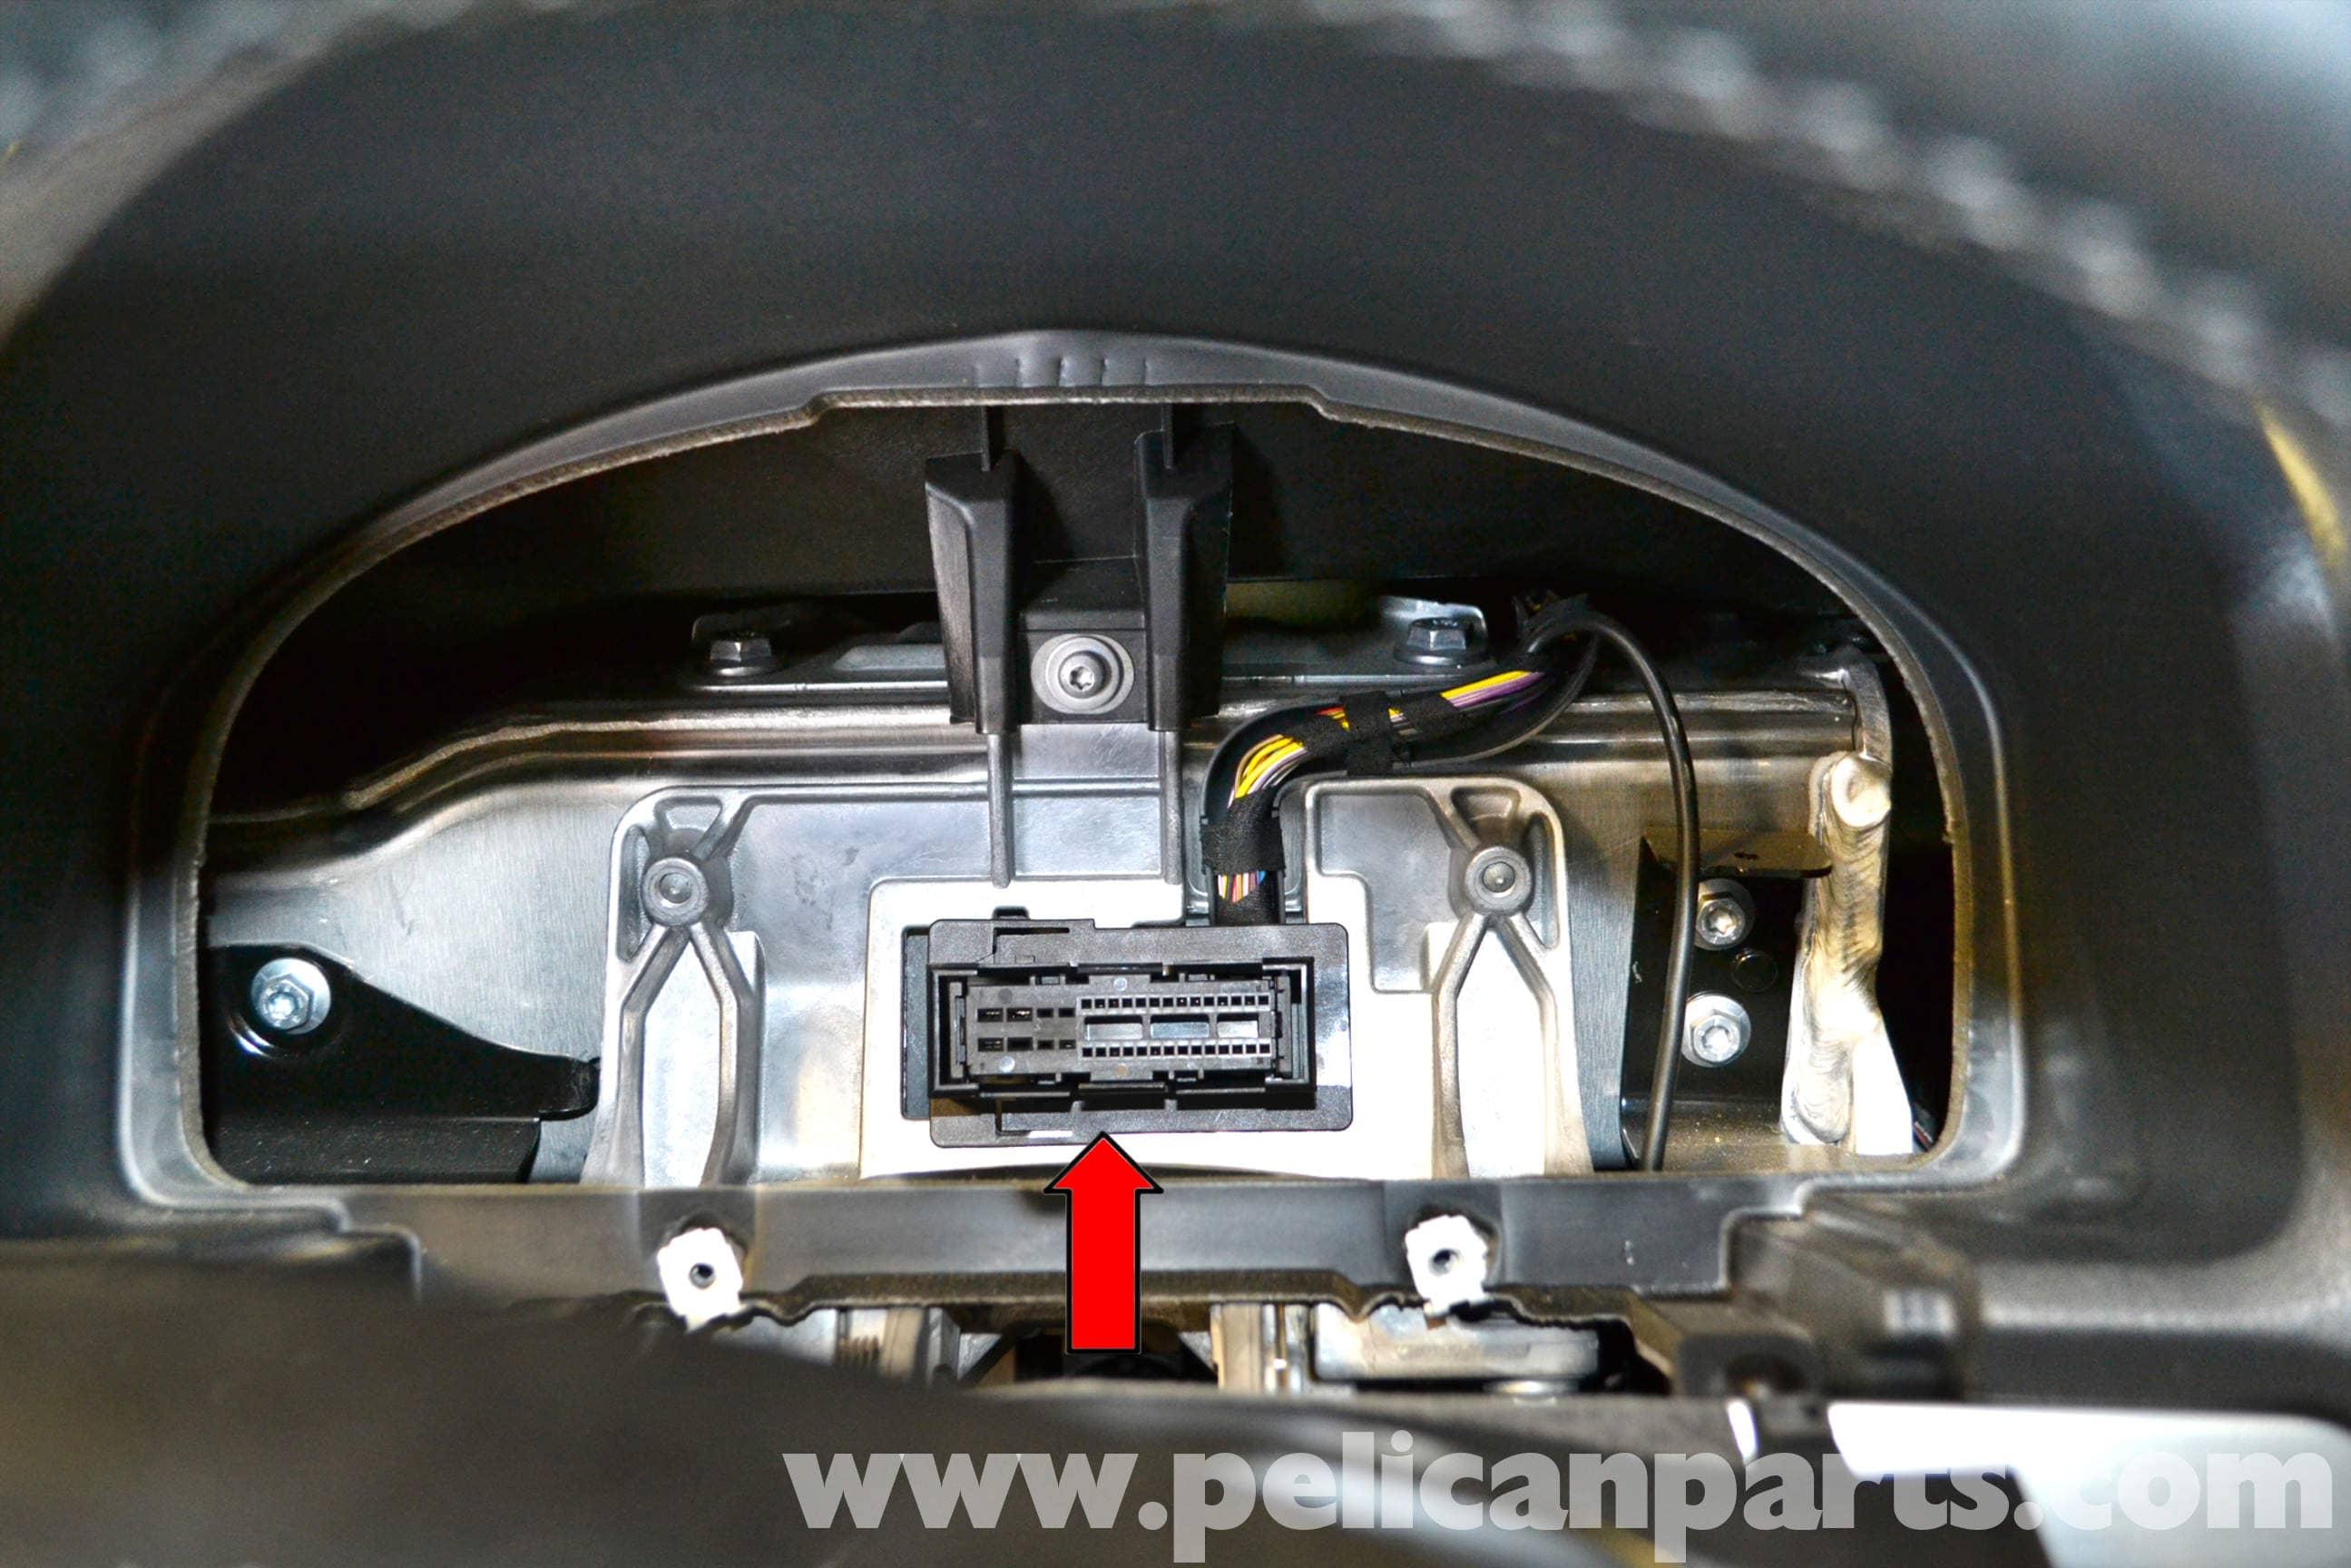 Volkswagen Golf GTI Mk V Instrument Cluster Removal (2006-2009